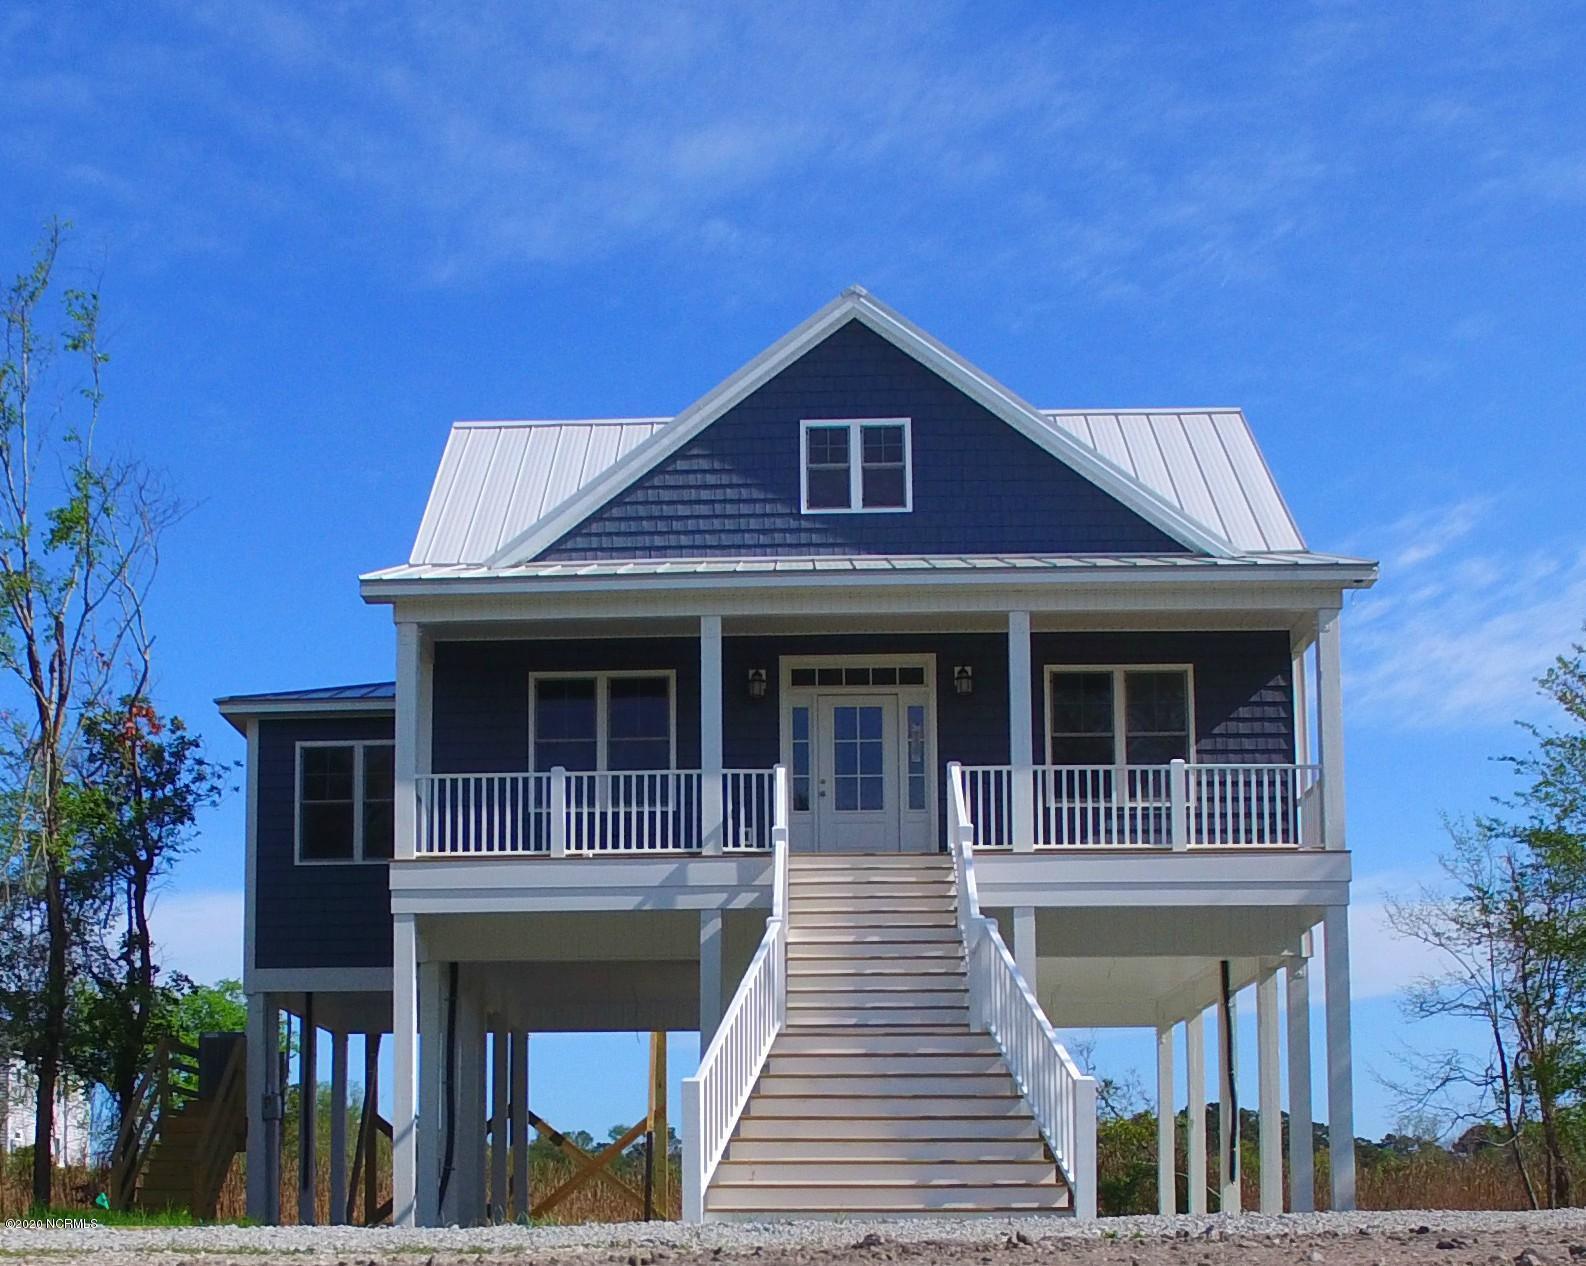 104 Bayside Drive, New Bern, North Carolina 28560, 3 Bedrooms Bedrooms, 6 Rooms Rooms,2 BathroomsBathrooms,Single family residence,For sale,Bayside,100240633